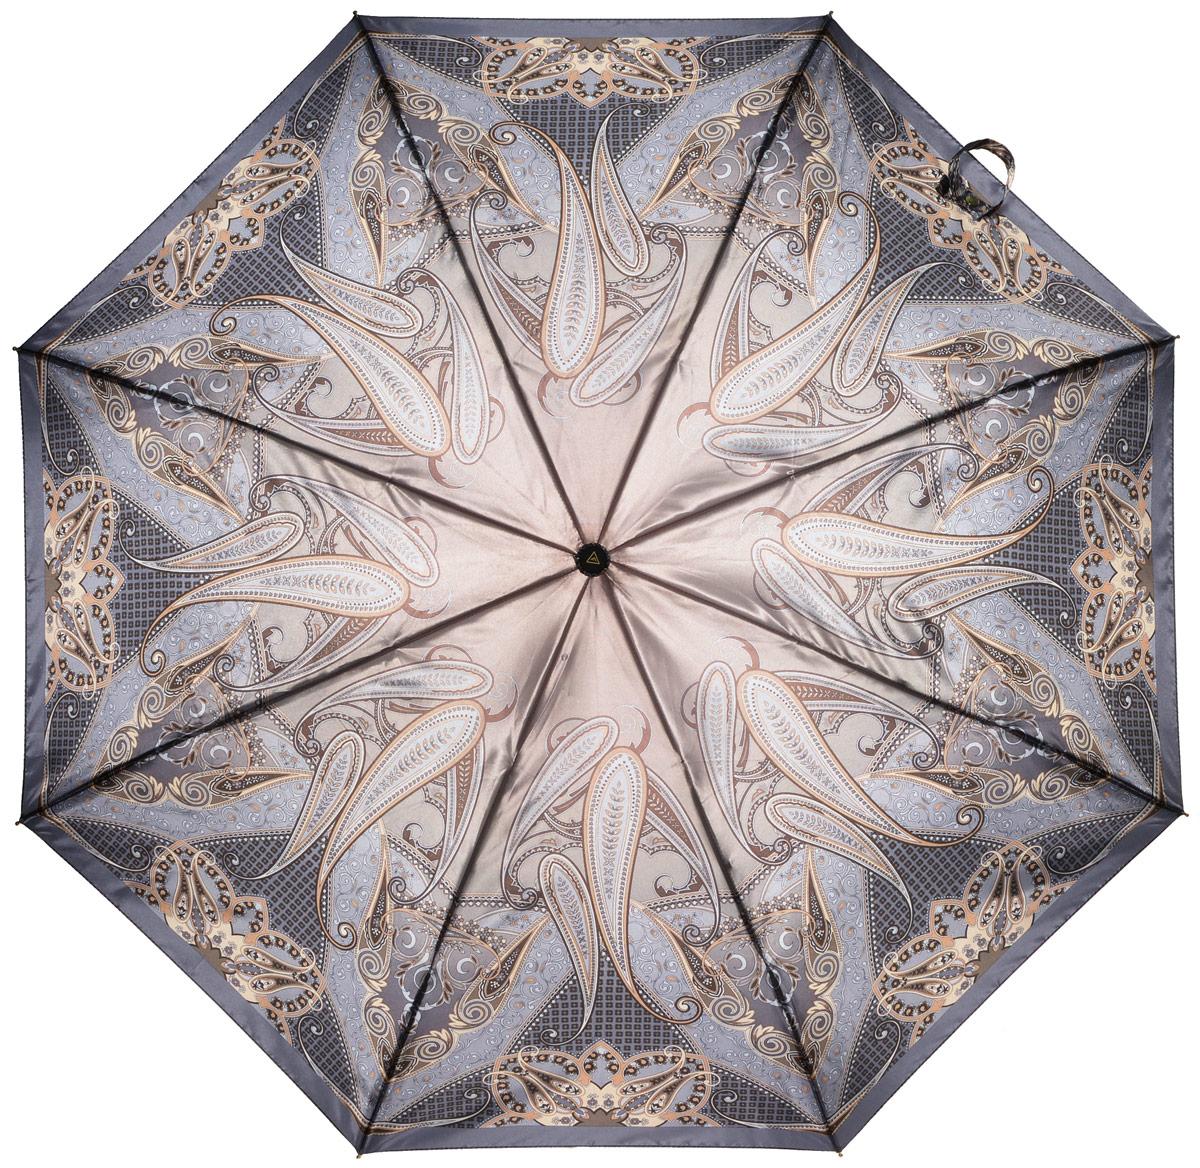 Зонт женский Fabretti, автомат, 3 сложения. L-16107-26L-16107-26Зонт женский Fabretti, облегченный суперавтомат, 3 сложения